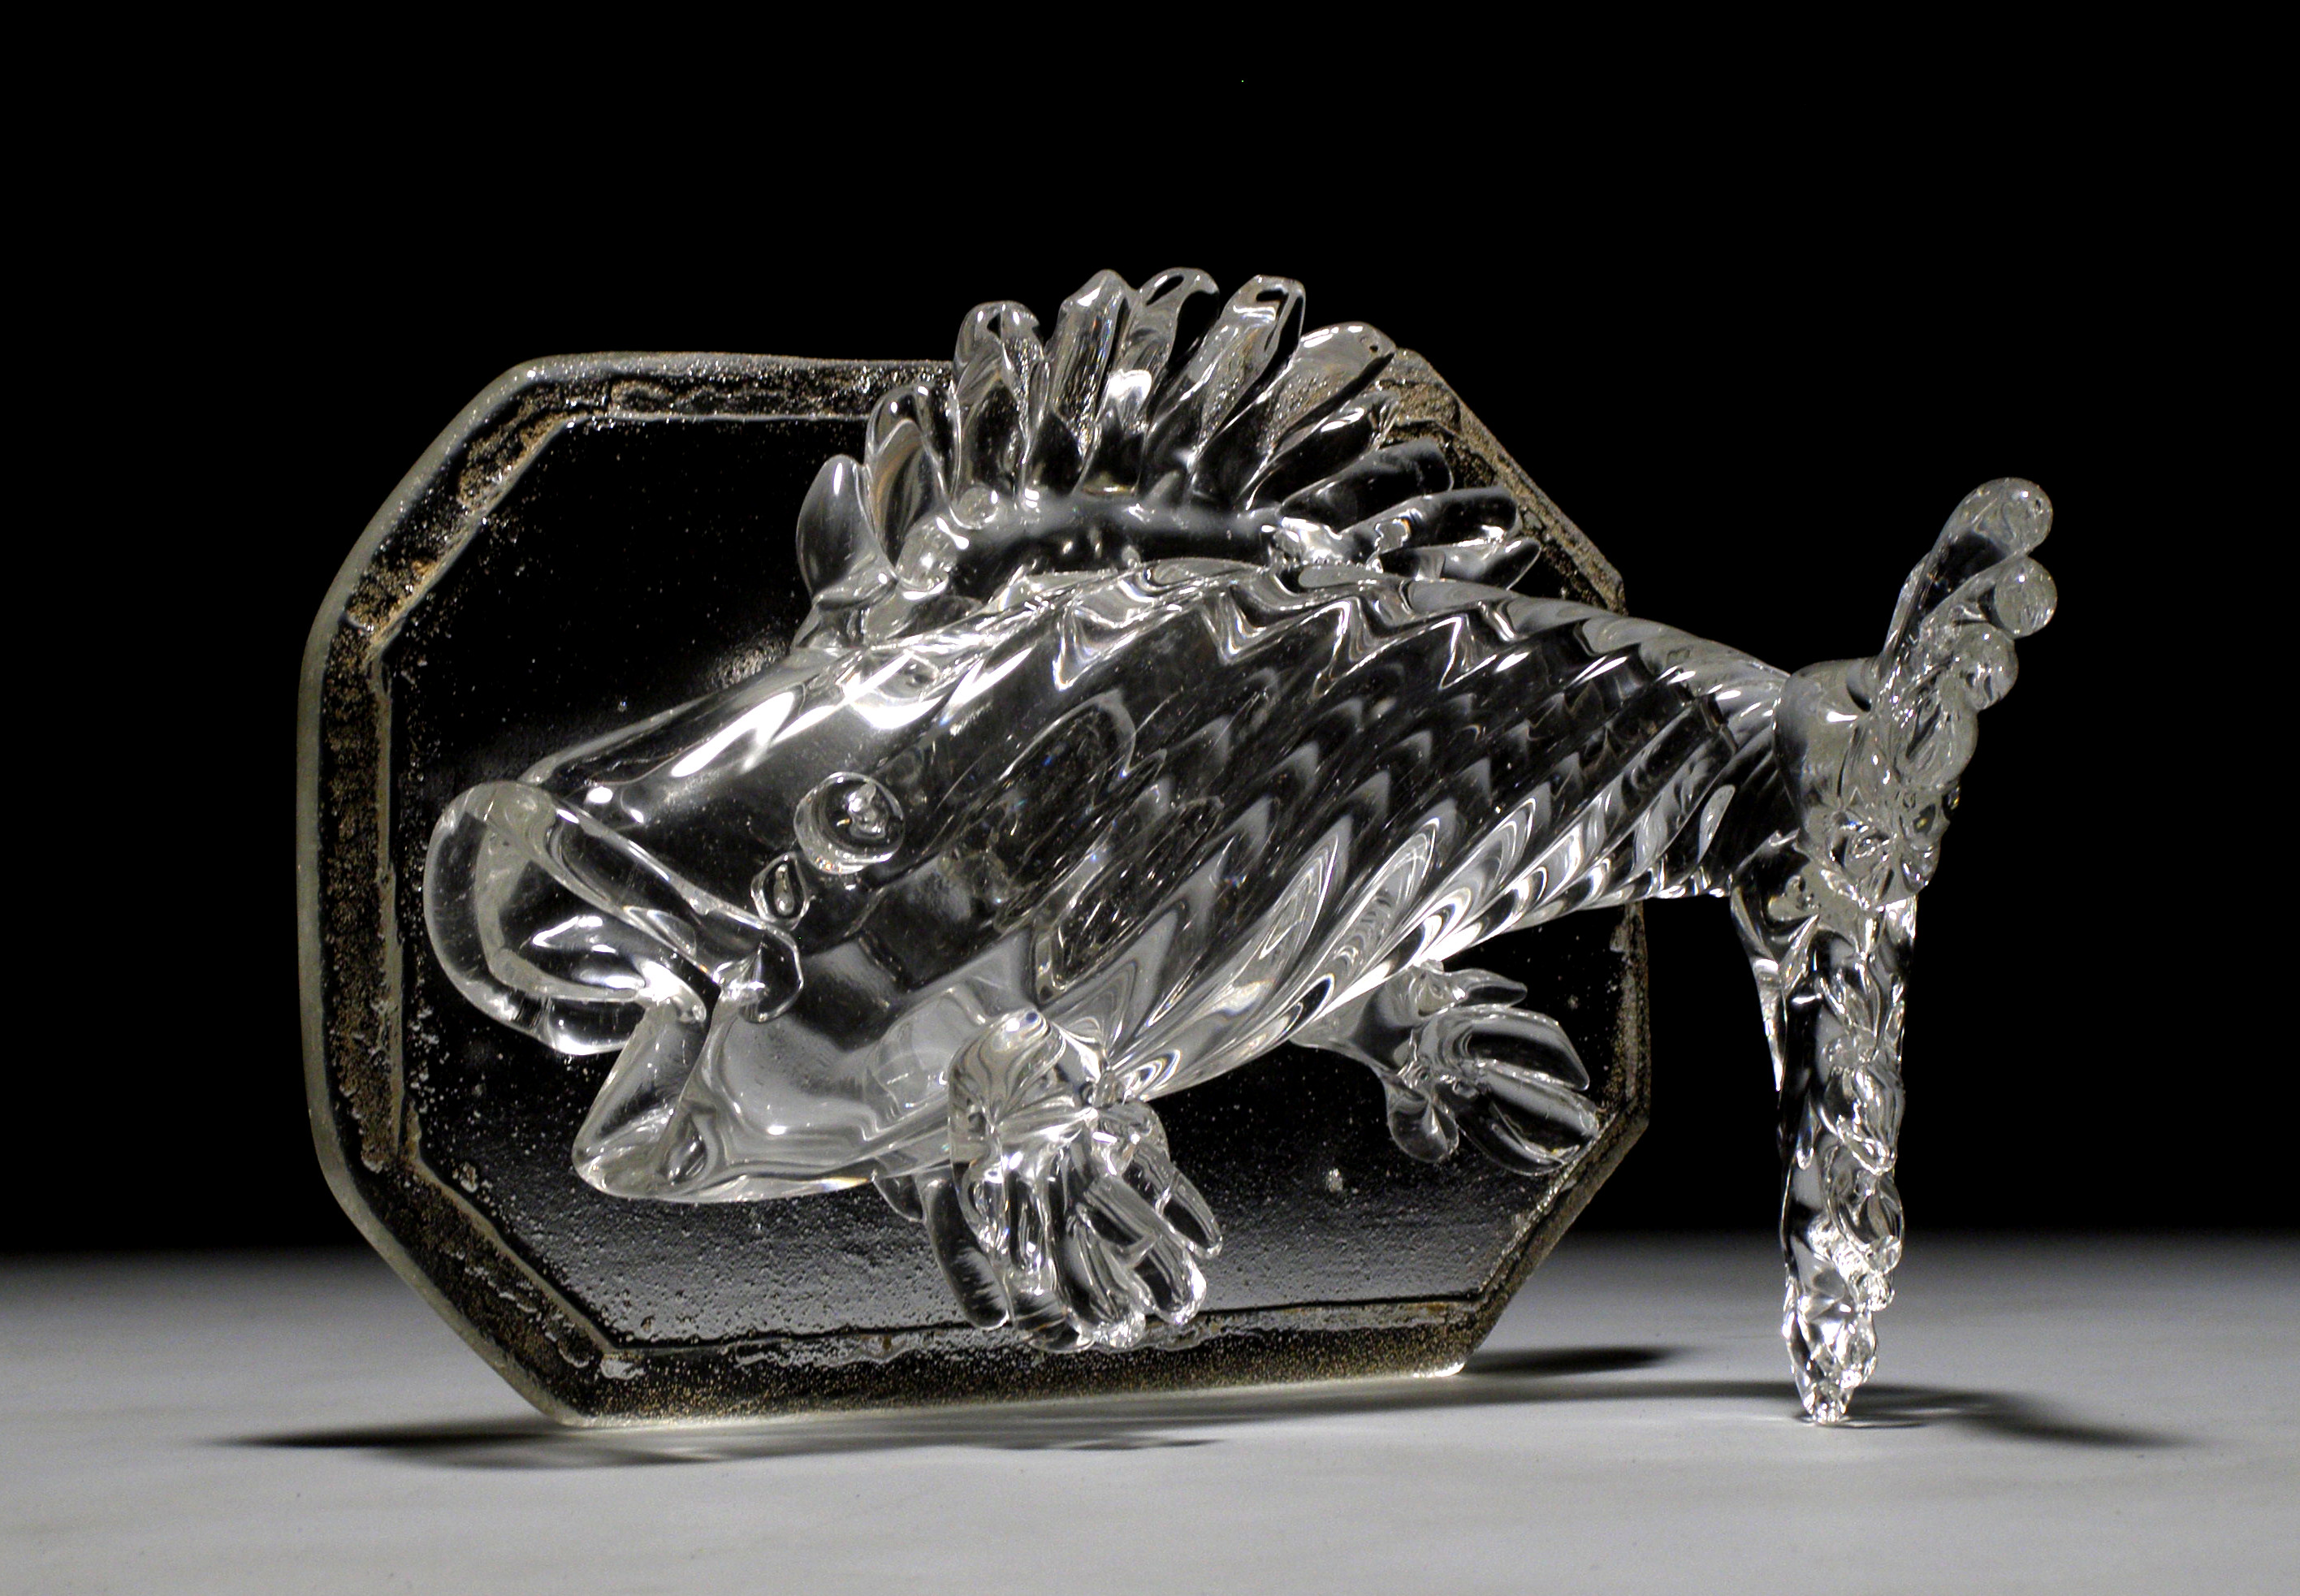 The Original Trophy Fish